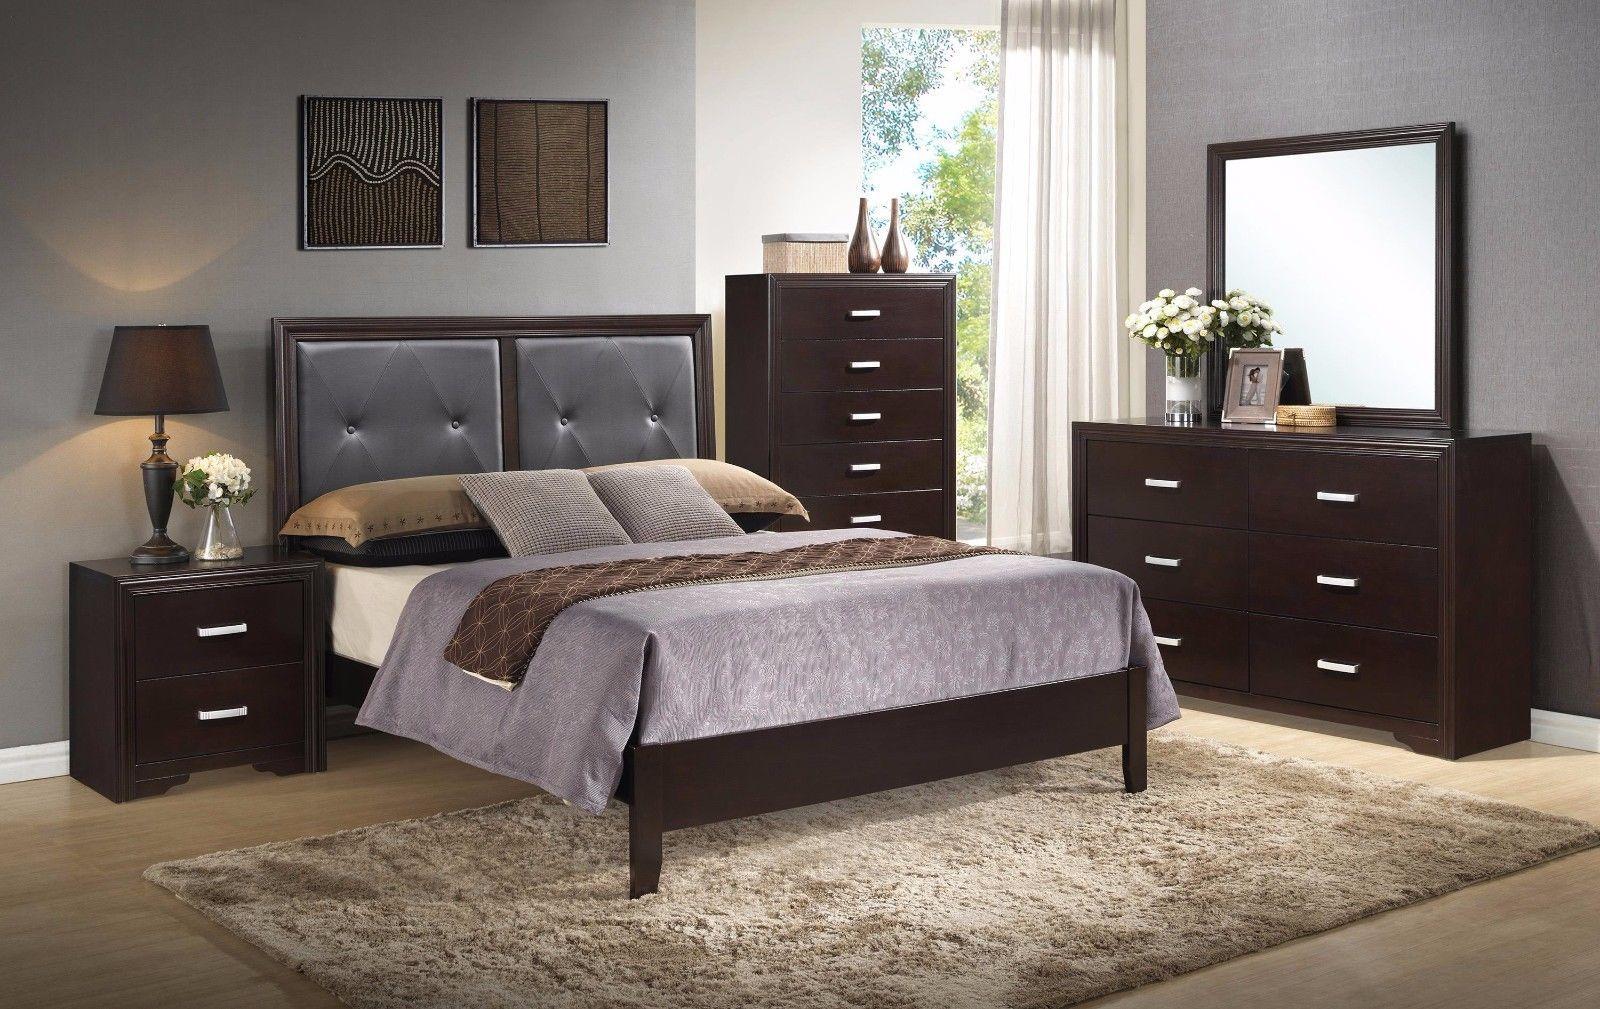 Crown Mark RB5300 Elijah King Size Bedroom Set 2 Night Stands Transitional Style